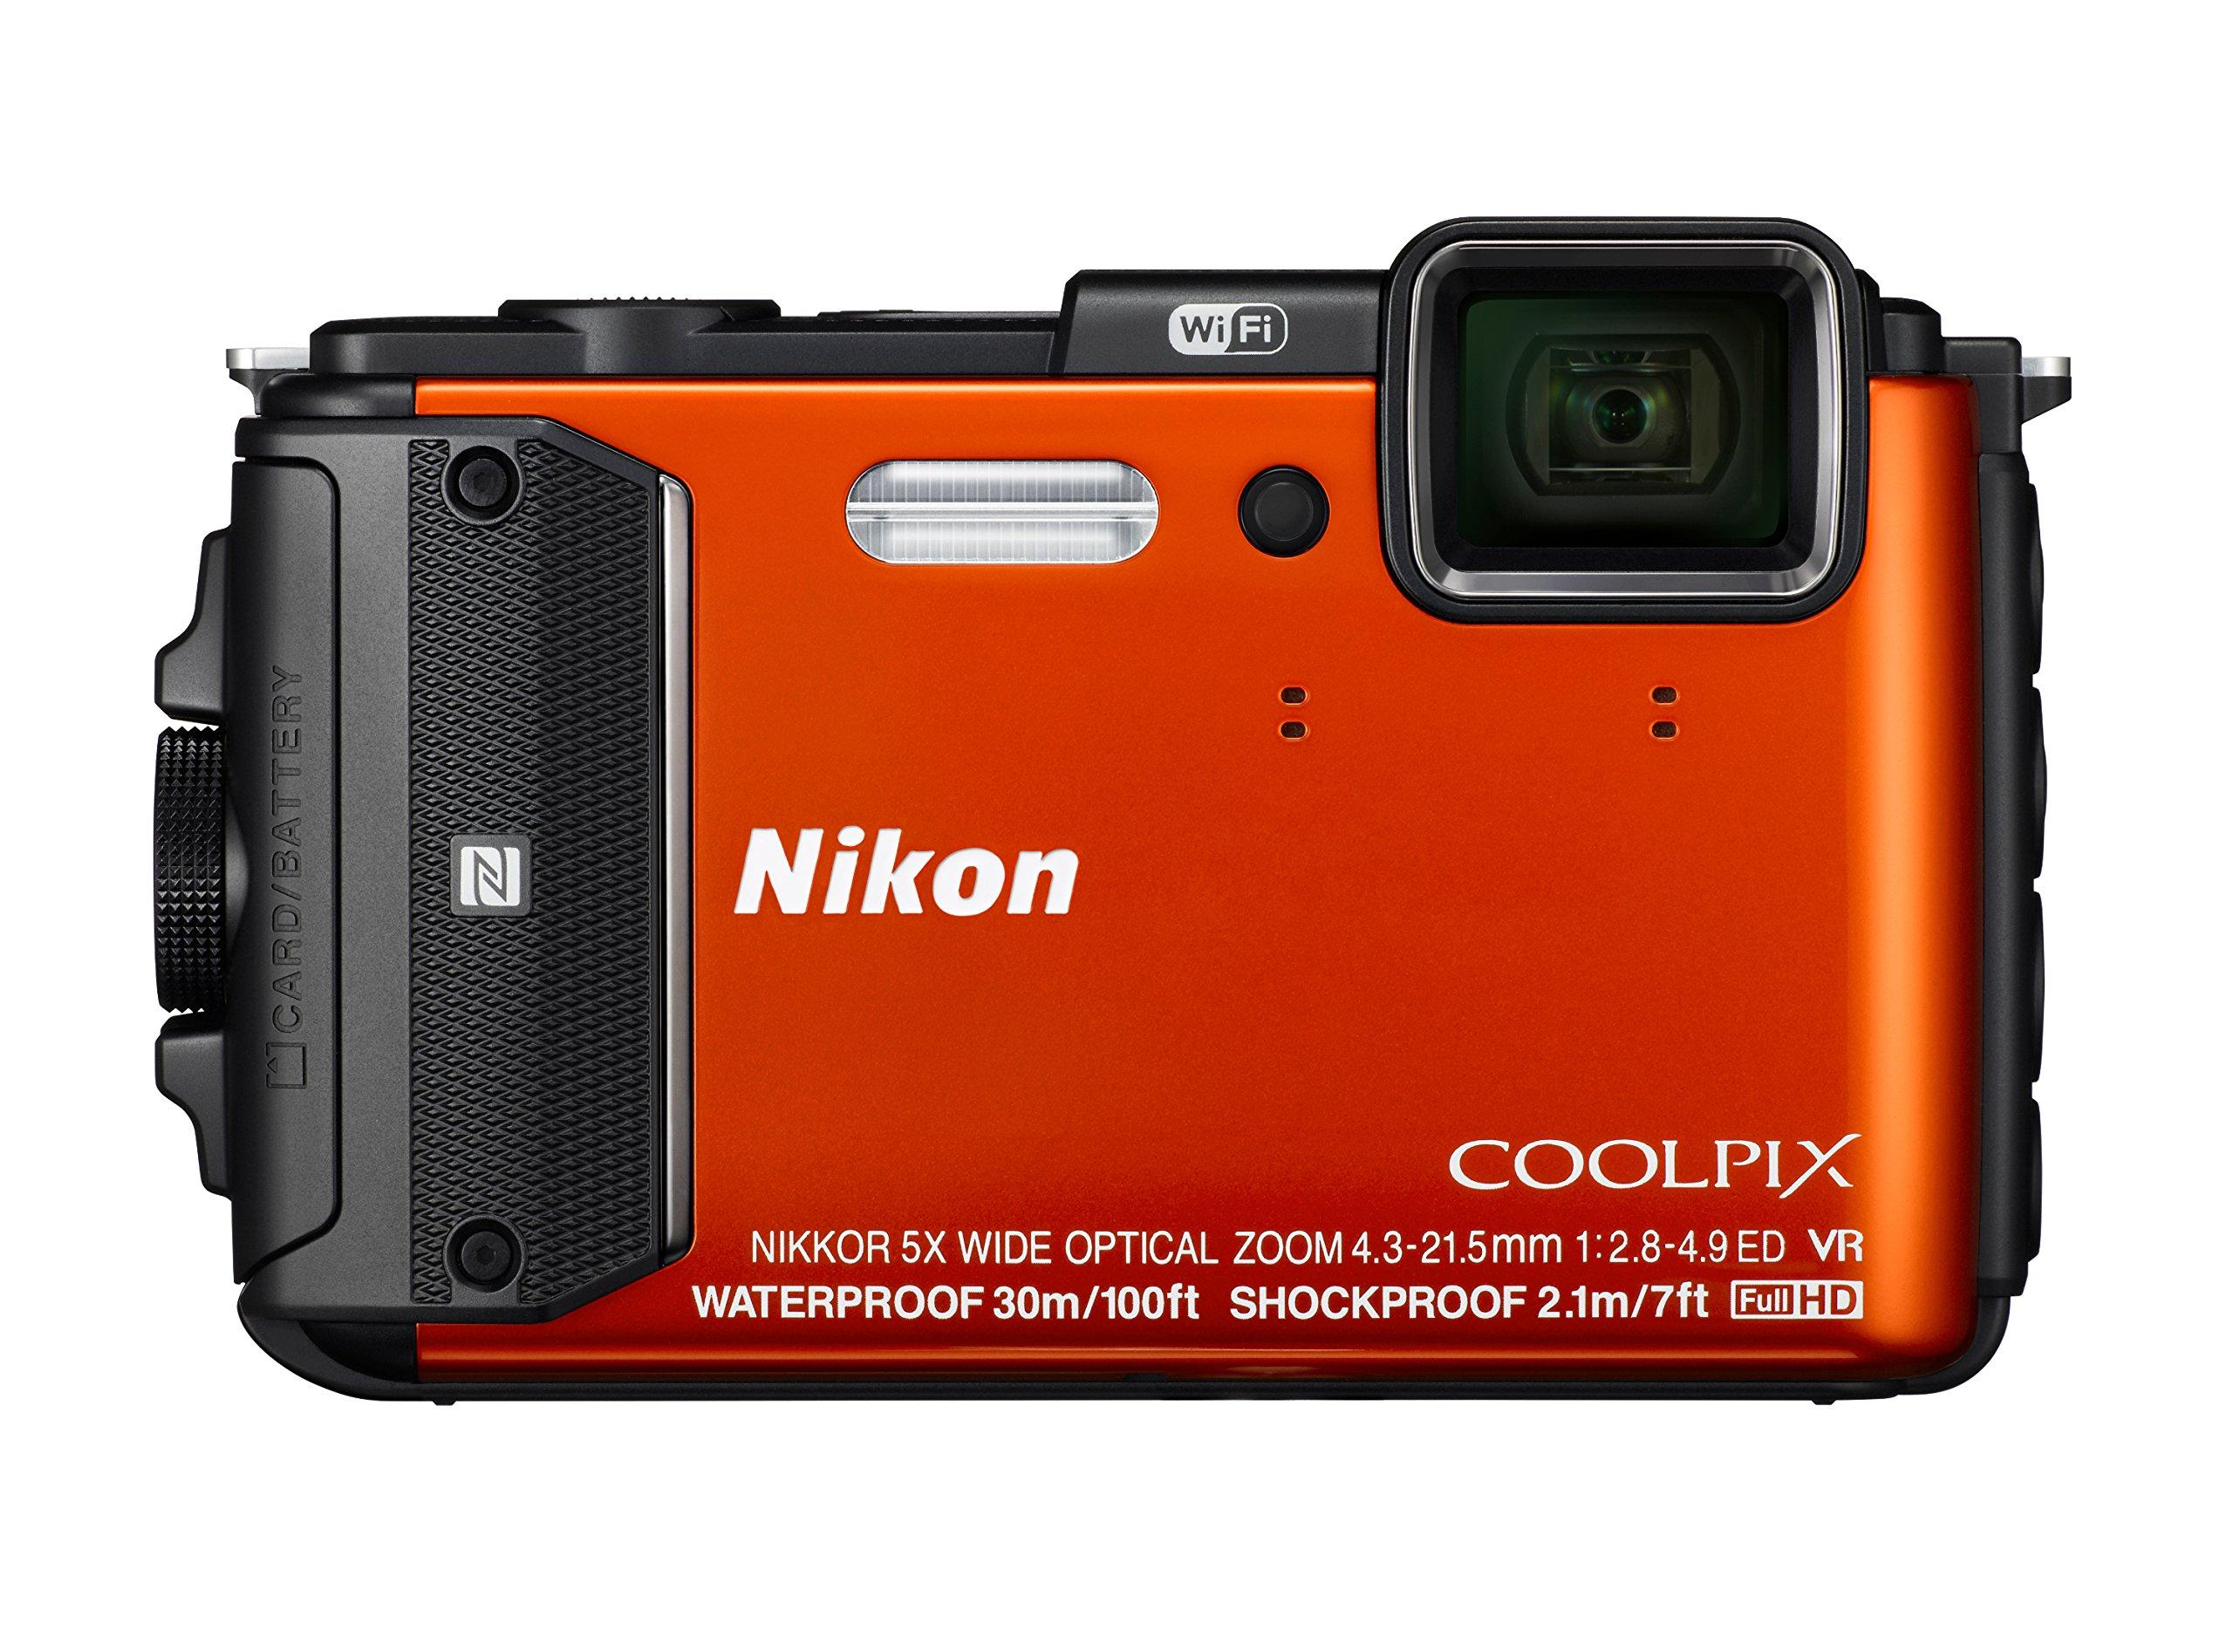 Nikon Coolpix AW130 Shock & Waterproof GPS Digital Camera (Orange) - International Version by Nikon